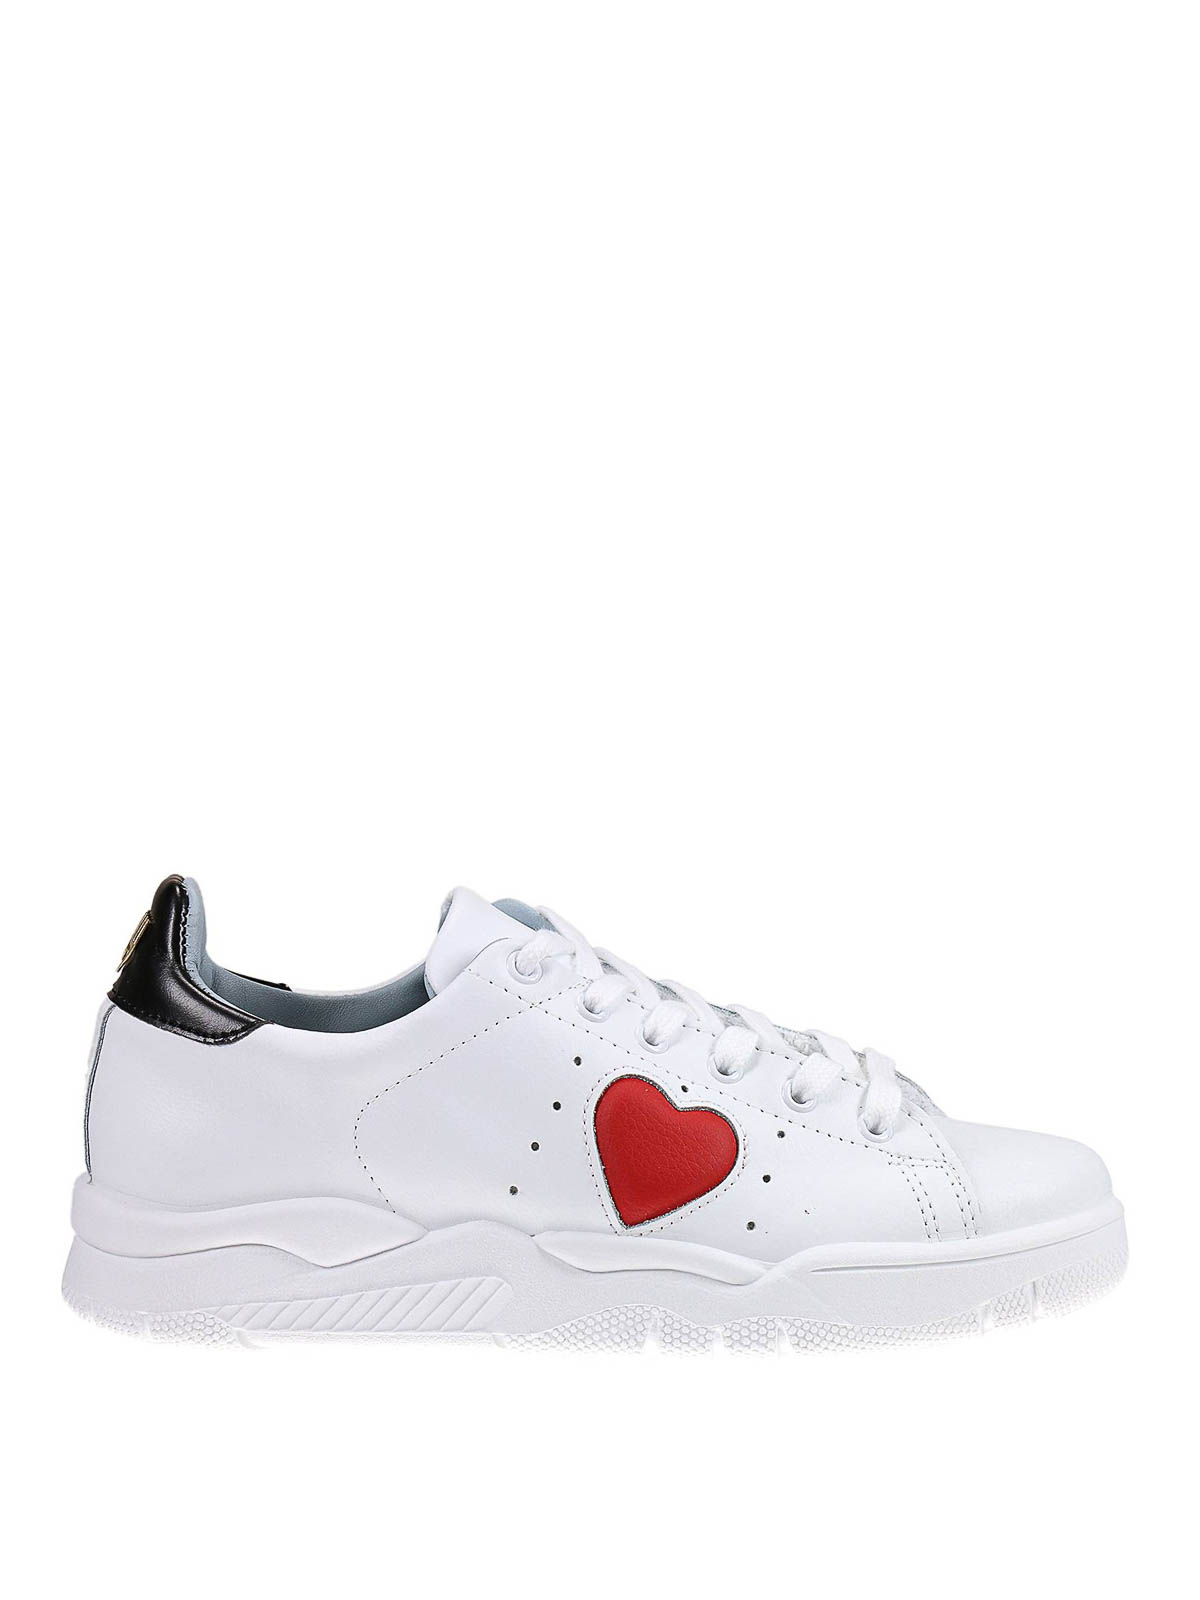 Roger Heart leather sneakers Chiara Ferragni c0sQDlu